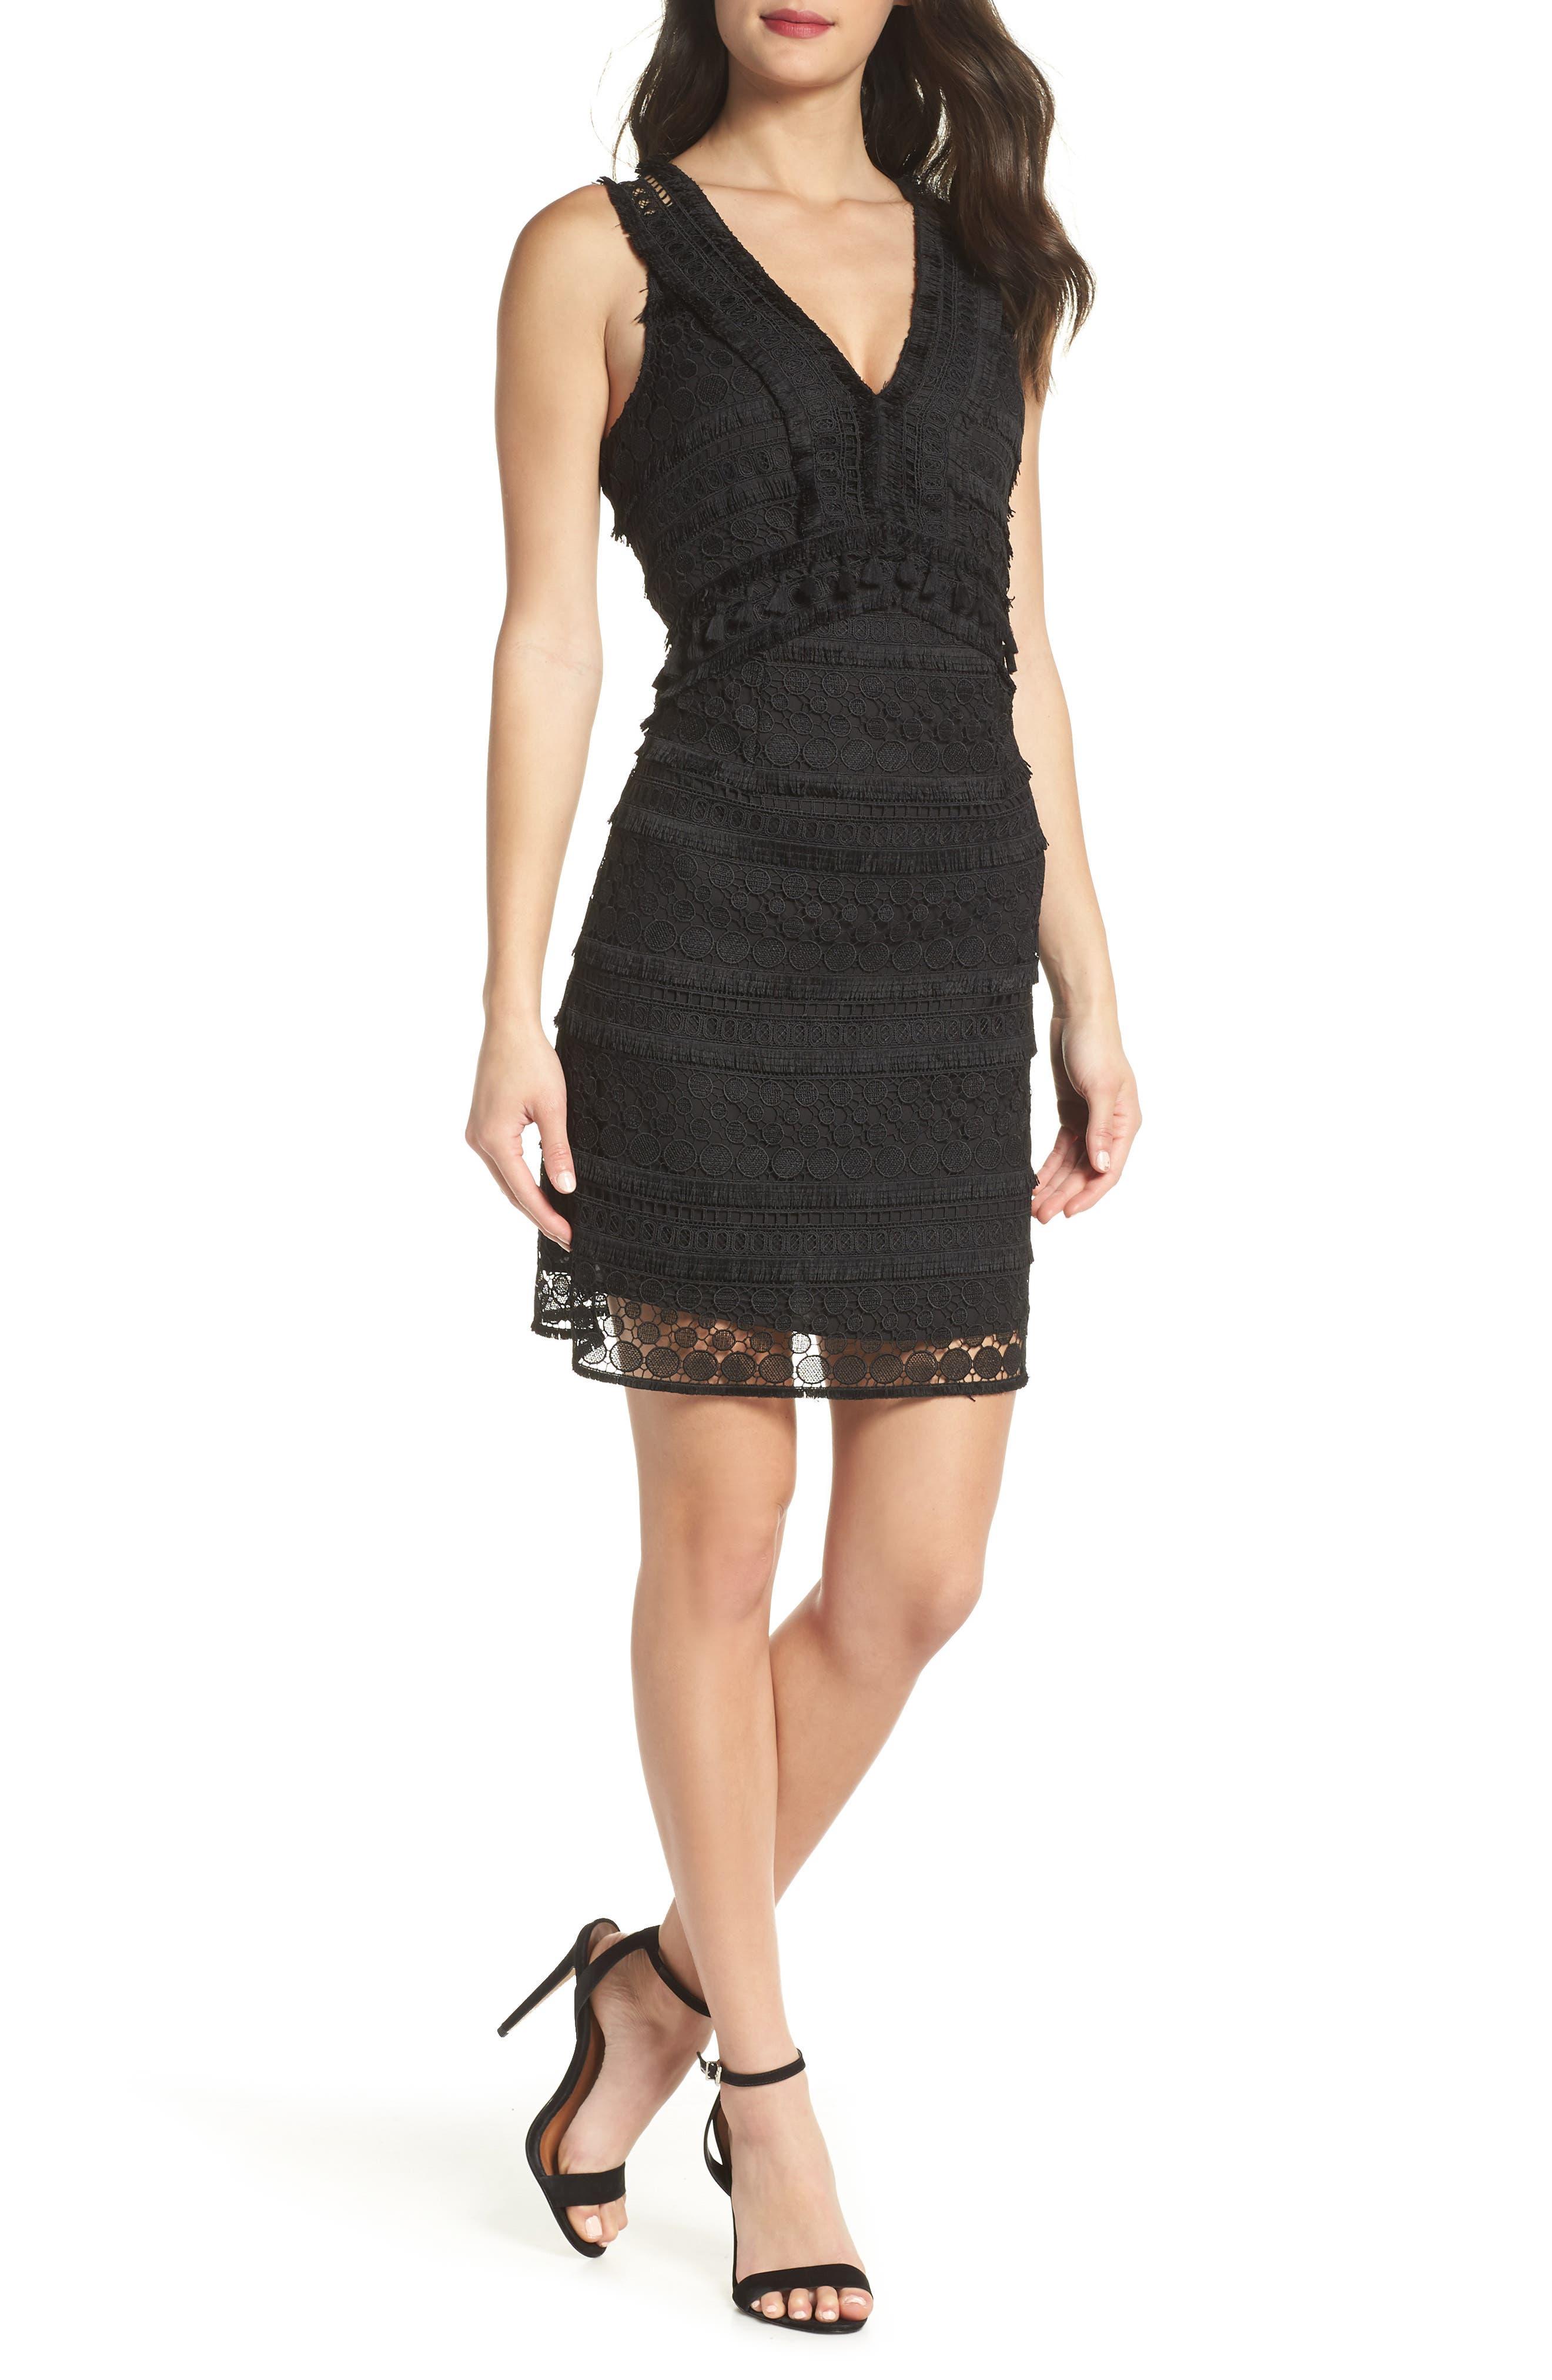 SAM EDELMAN, Lace Sheath Dress, Main thumbnail 1, color, 001